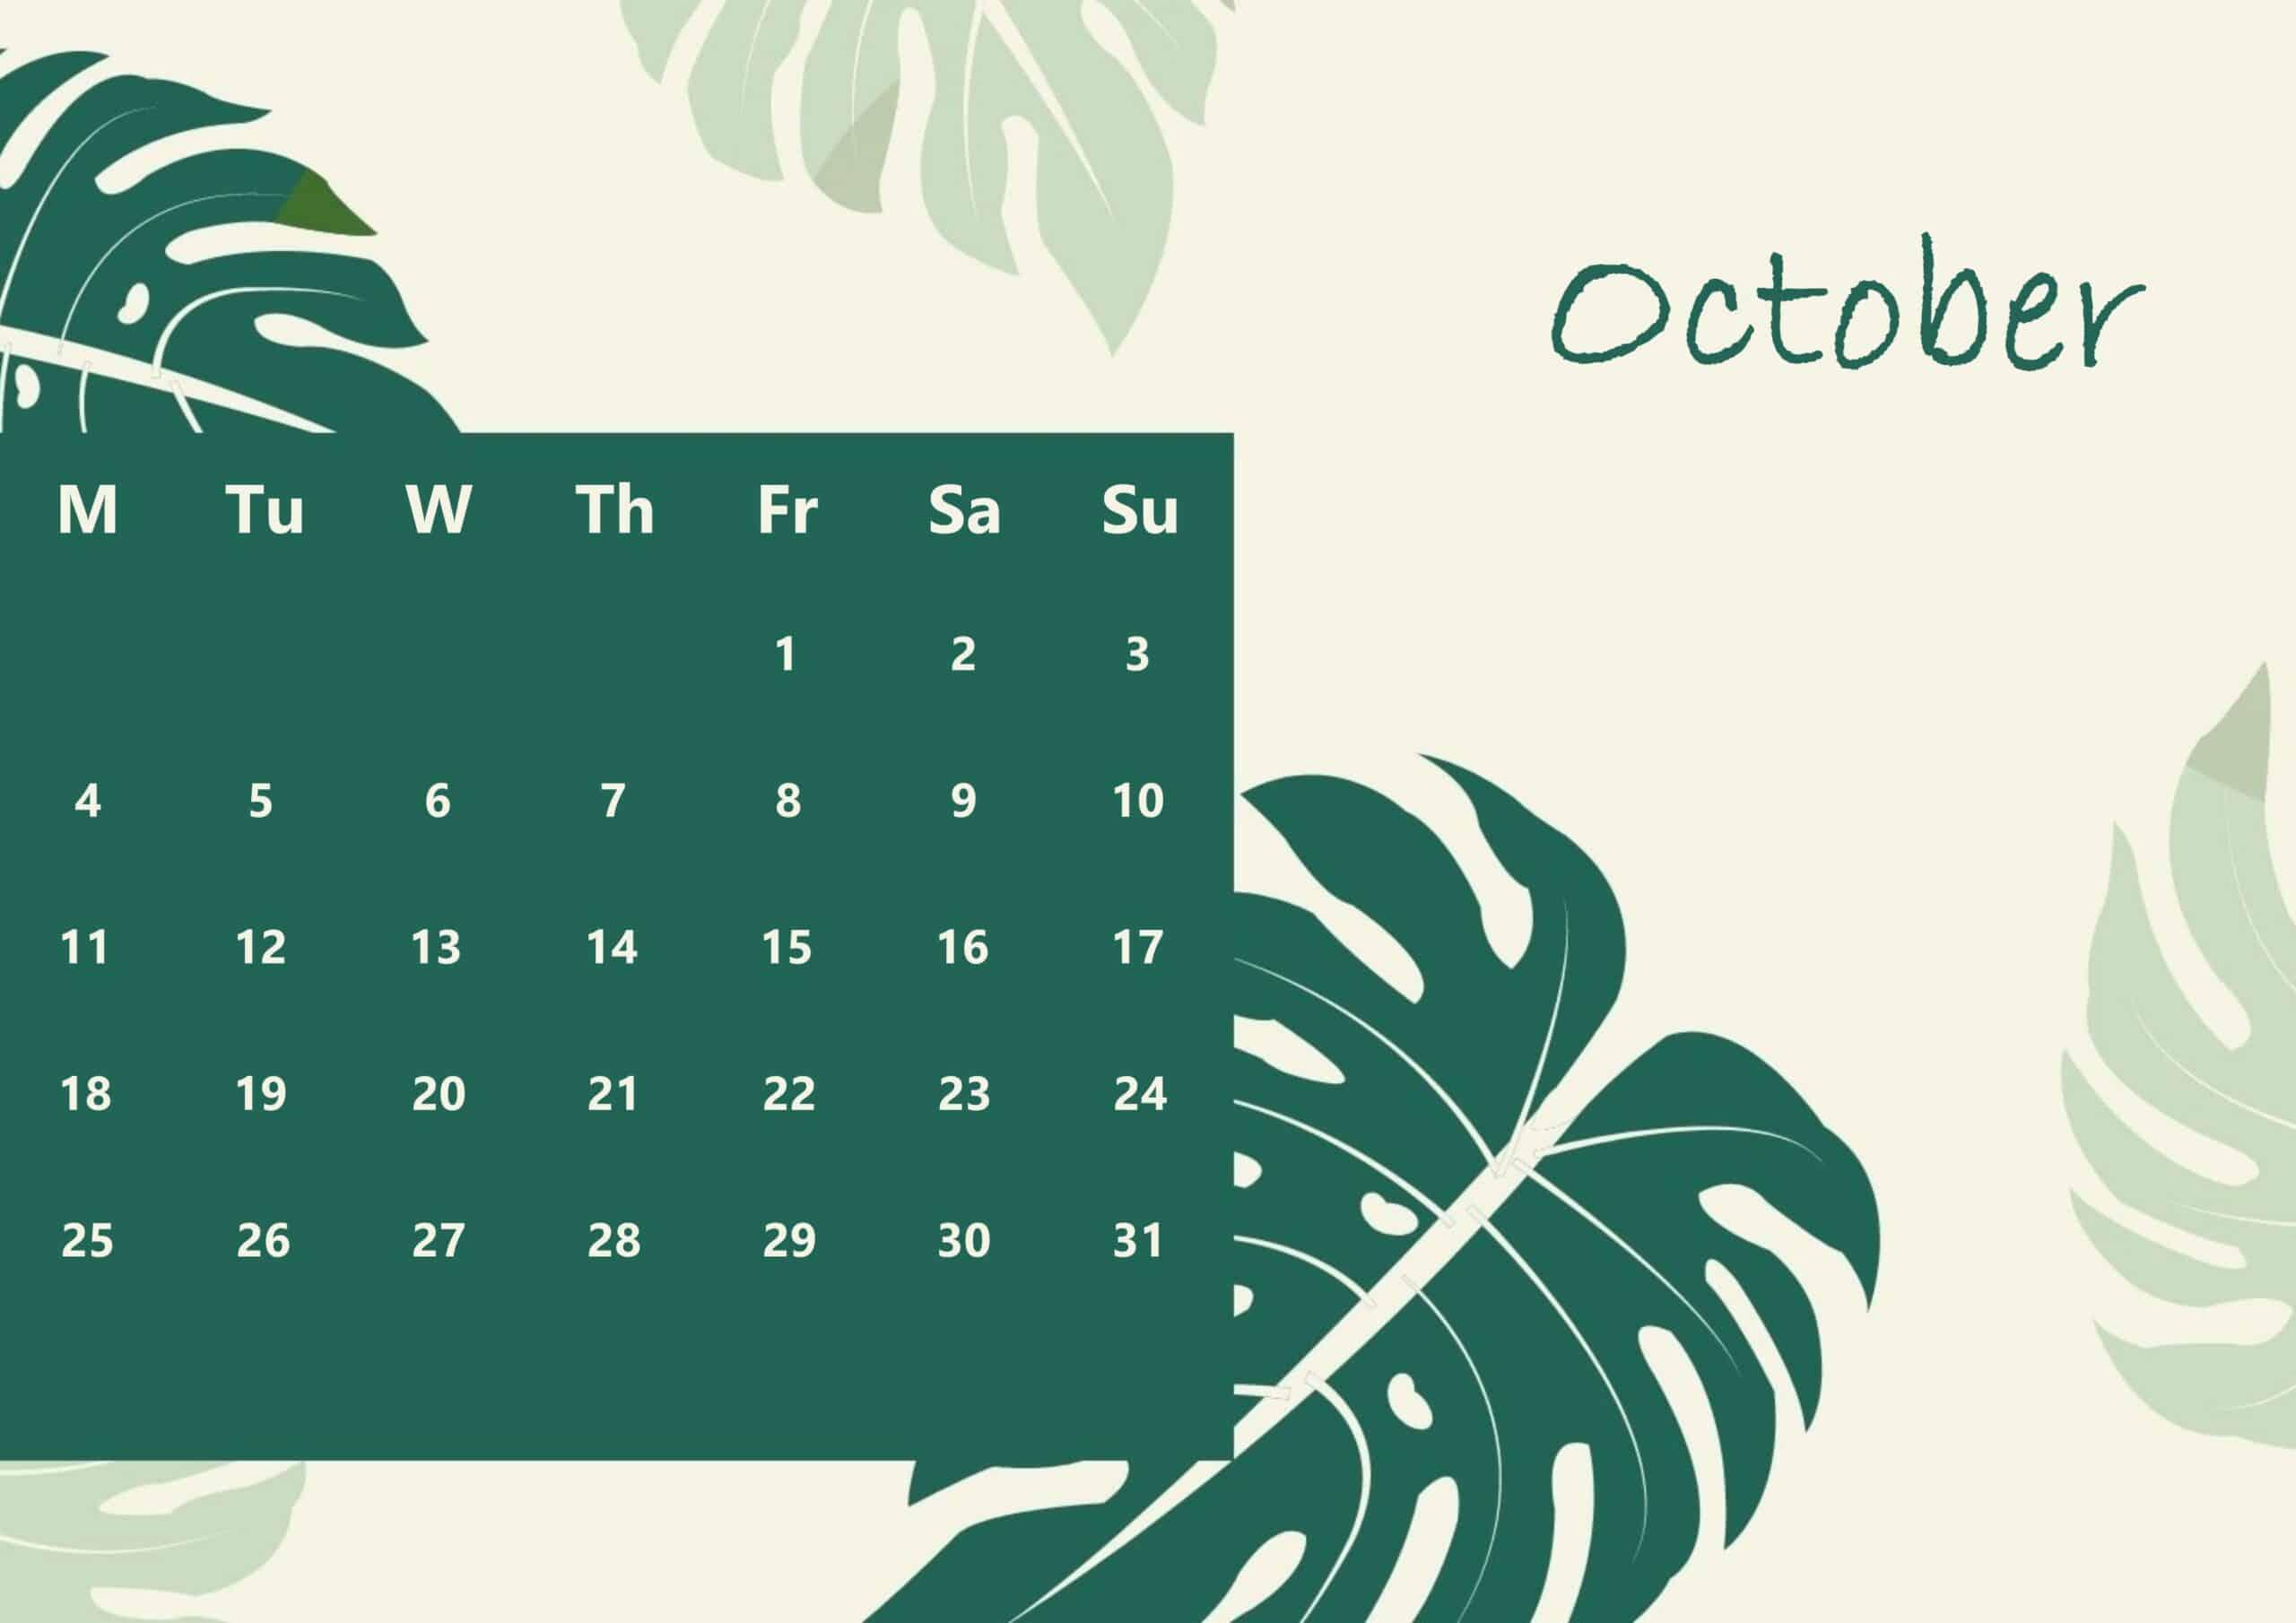 Cute October 2021 Calendar ForMAT